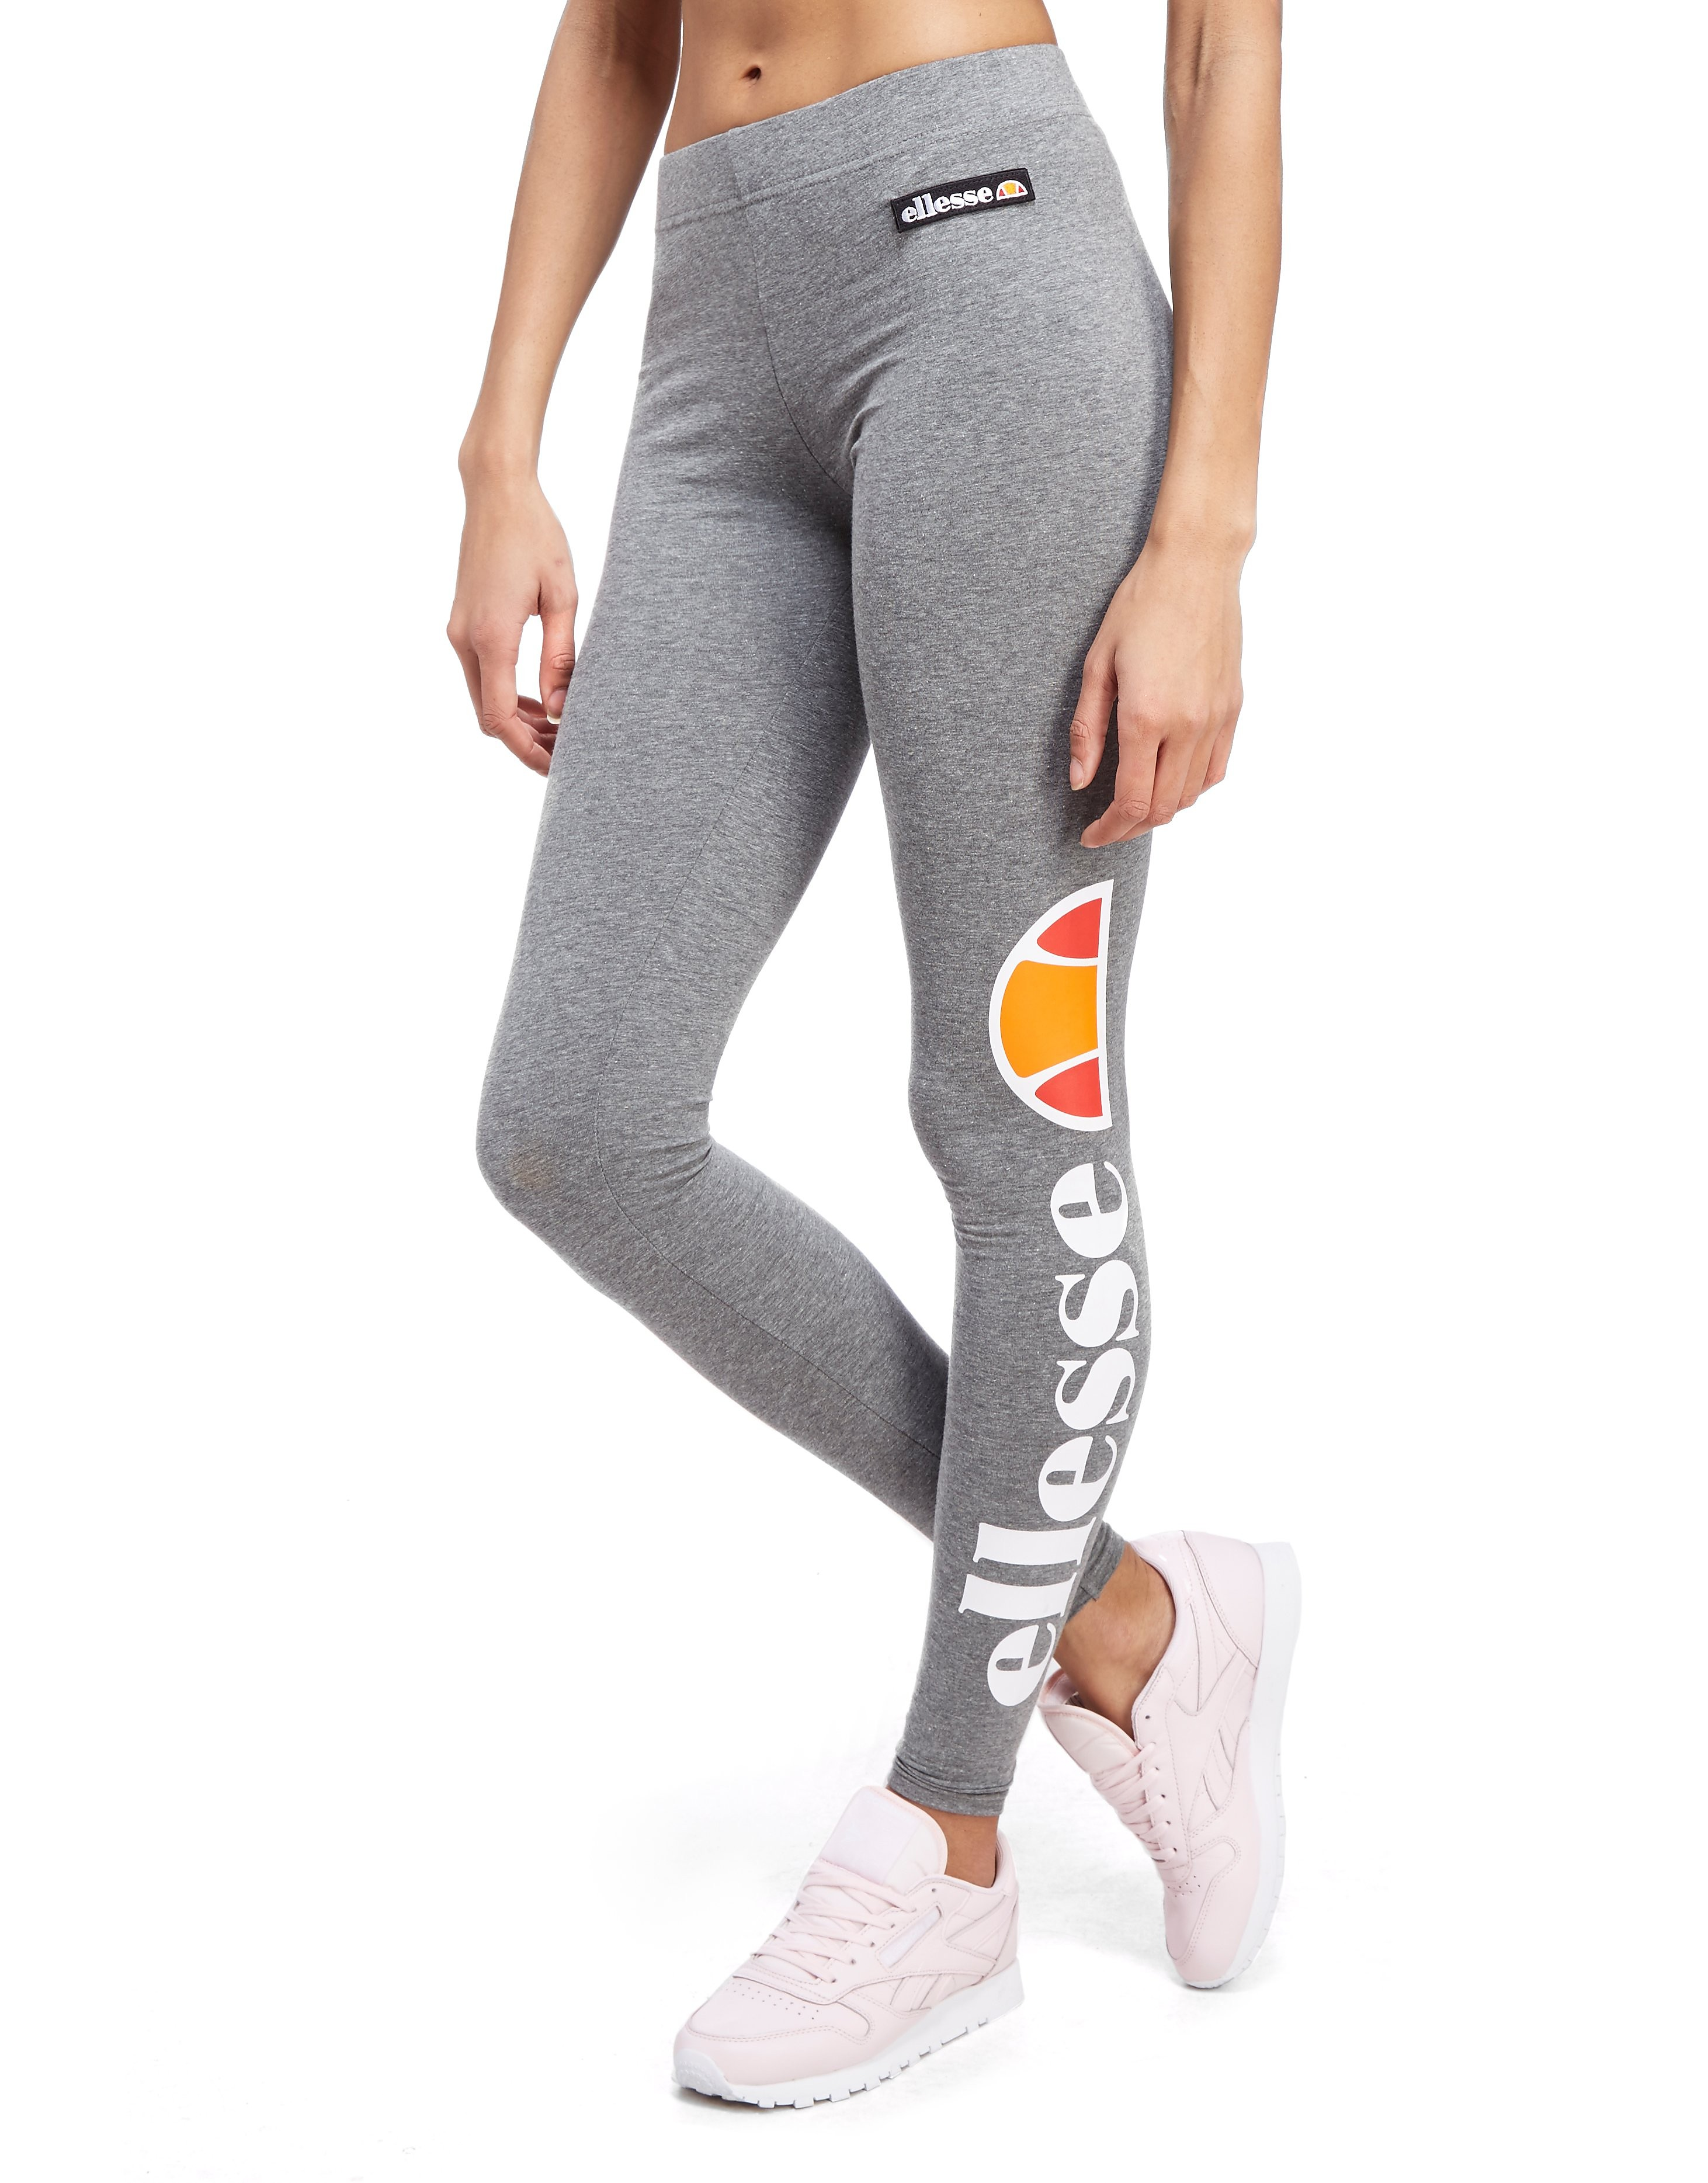 b4ff4622738a3 Ellesse Trevalli 2 Leggings - Charcoal - Womens - Sports King Store